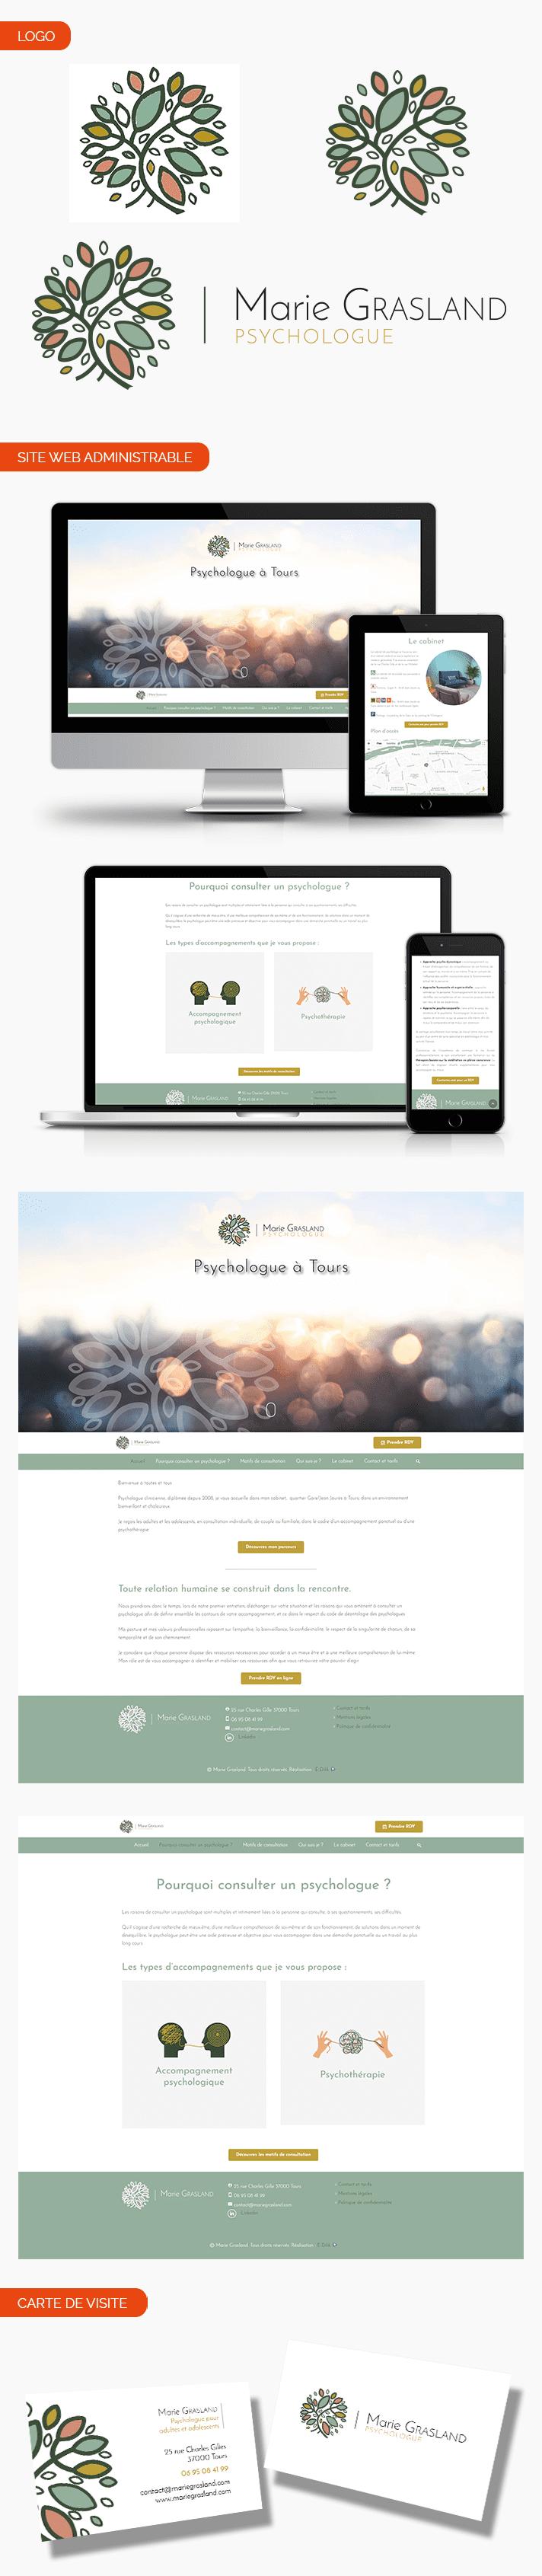 Aperçu site internet, vectorisation de logo et carte de visite pour Marie Grasland.